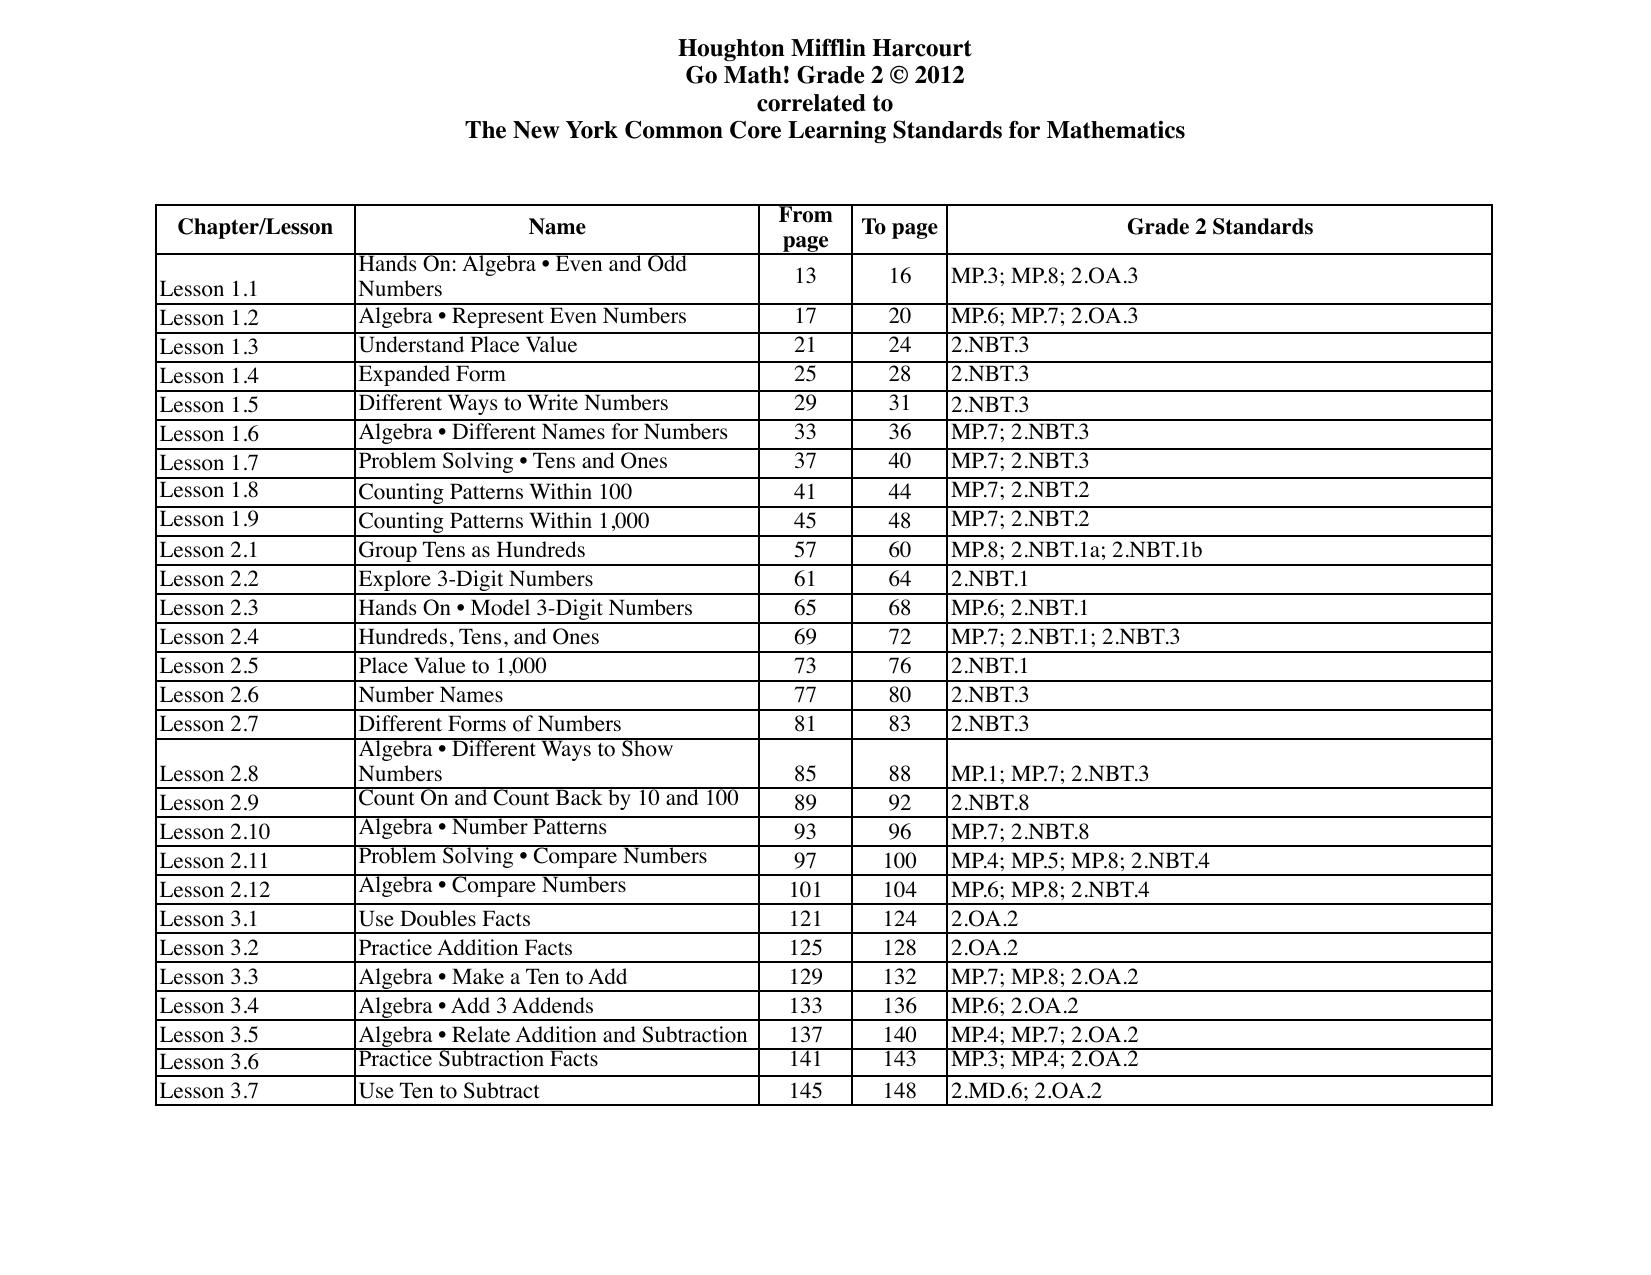 Houghton mifflin harcourt go math grade 2 2012 correlated to falaconquin